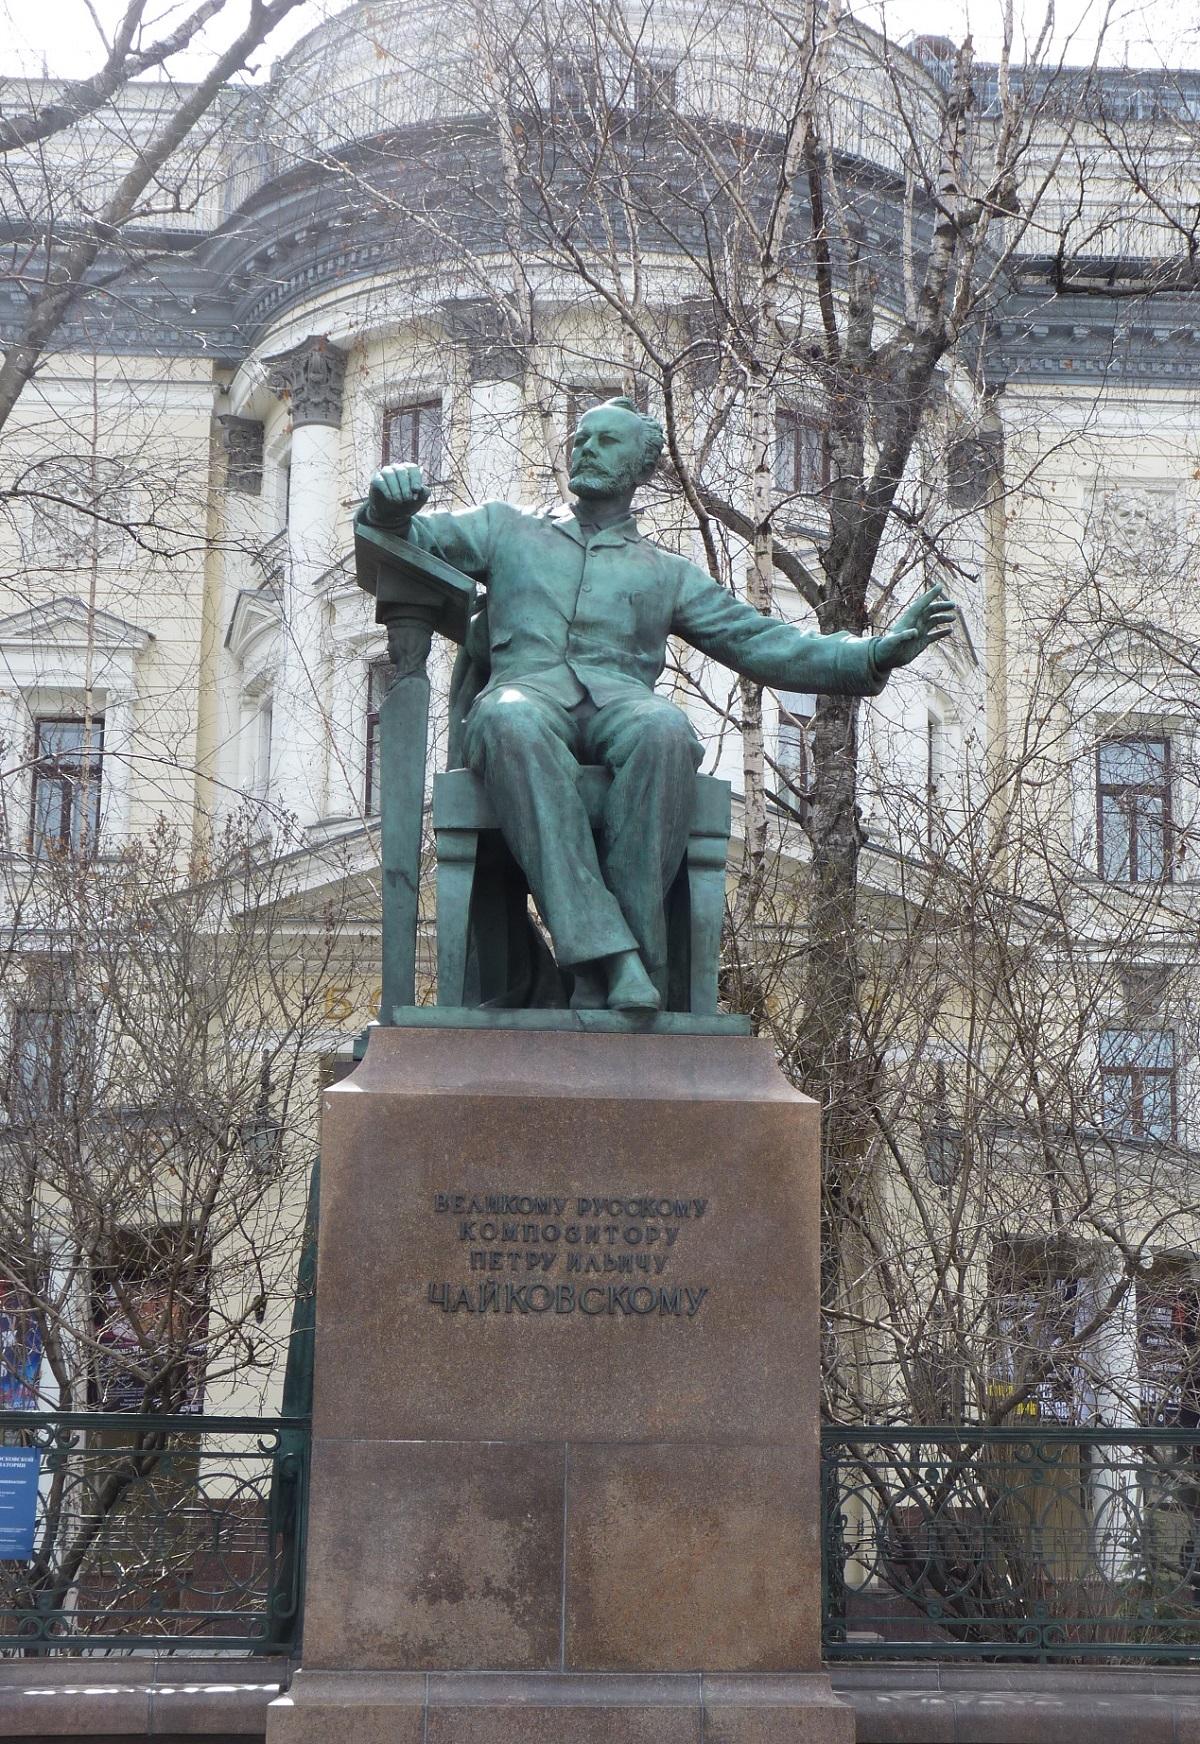 Tjaikovskii statue